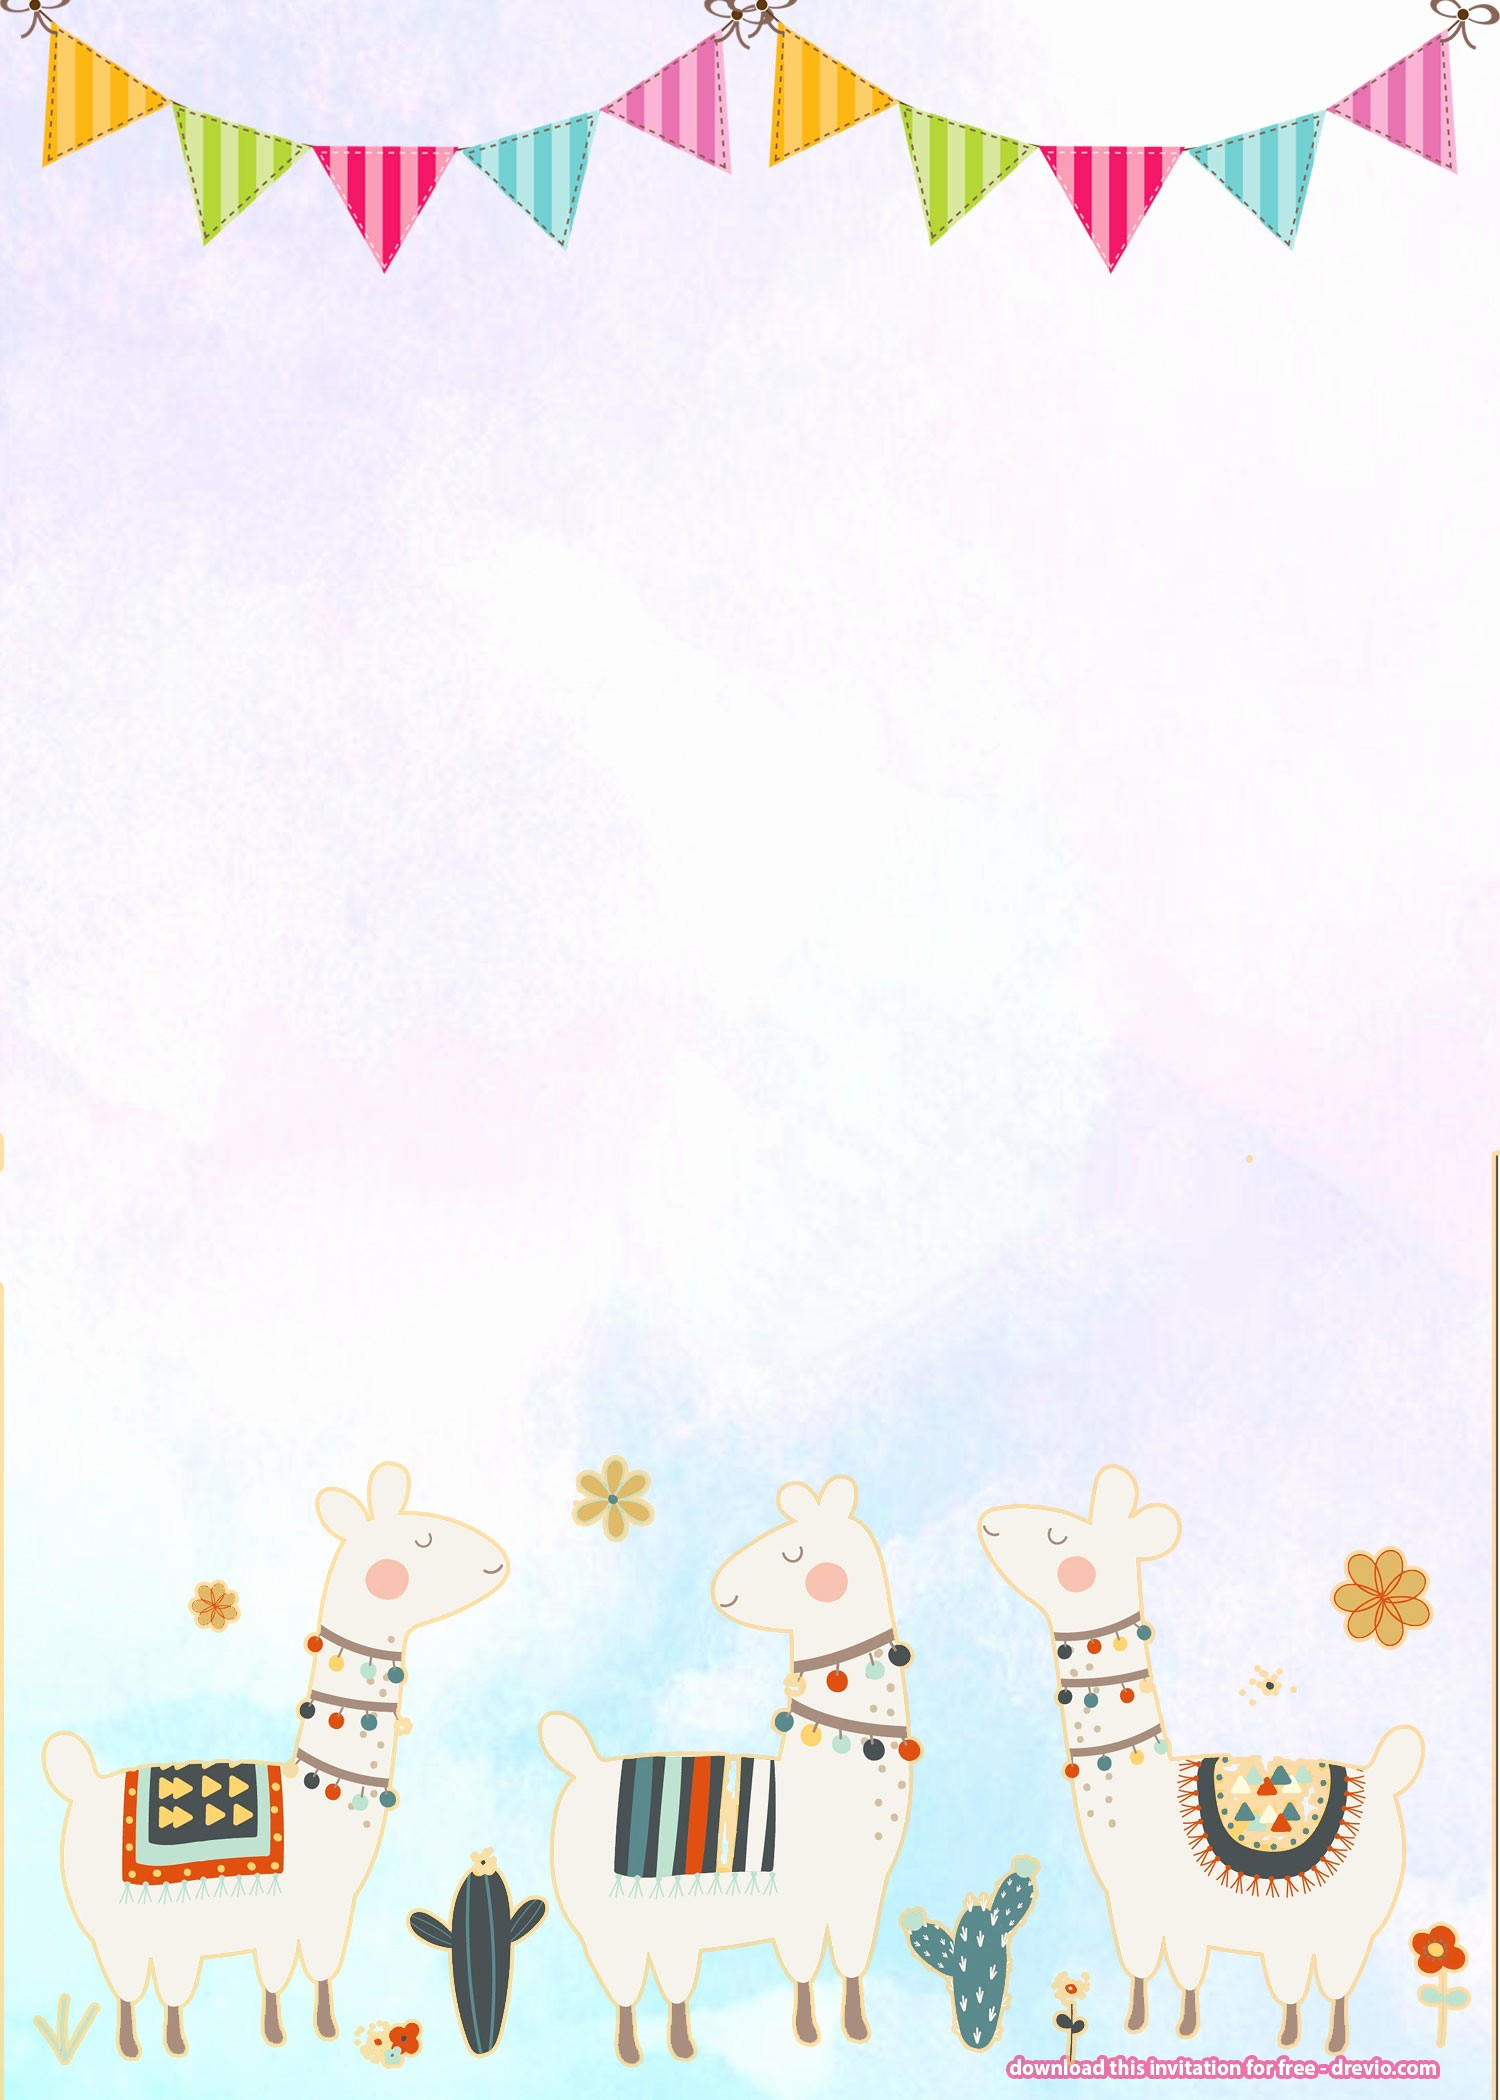 Free Templates for Birthday Invitations Elegant Free Llama Birthday Invitation Templates